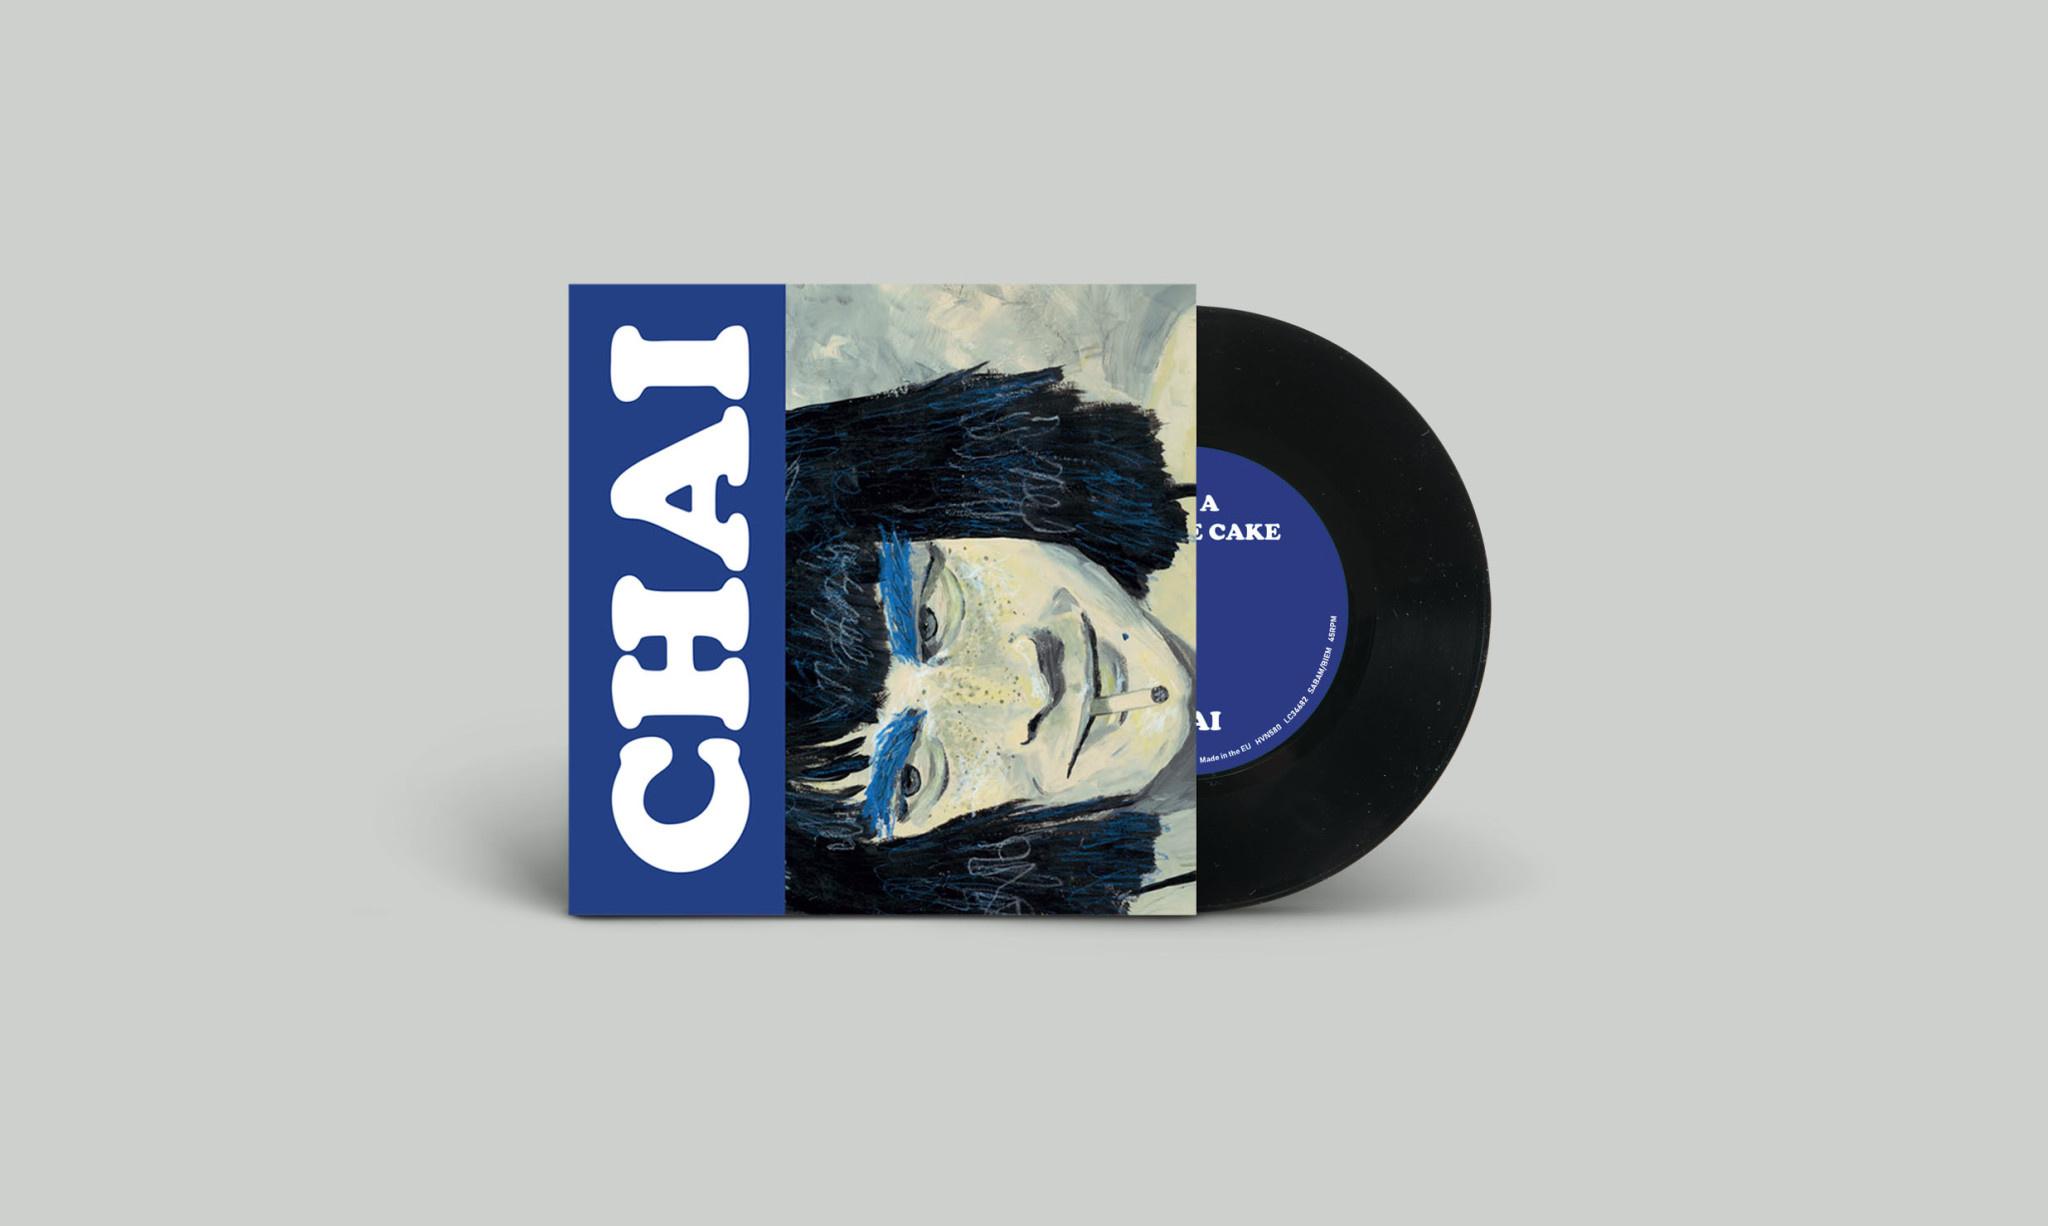 Heavenly Recordings CHAI - NO MORE CAKE/Ready Cheeky Pretty